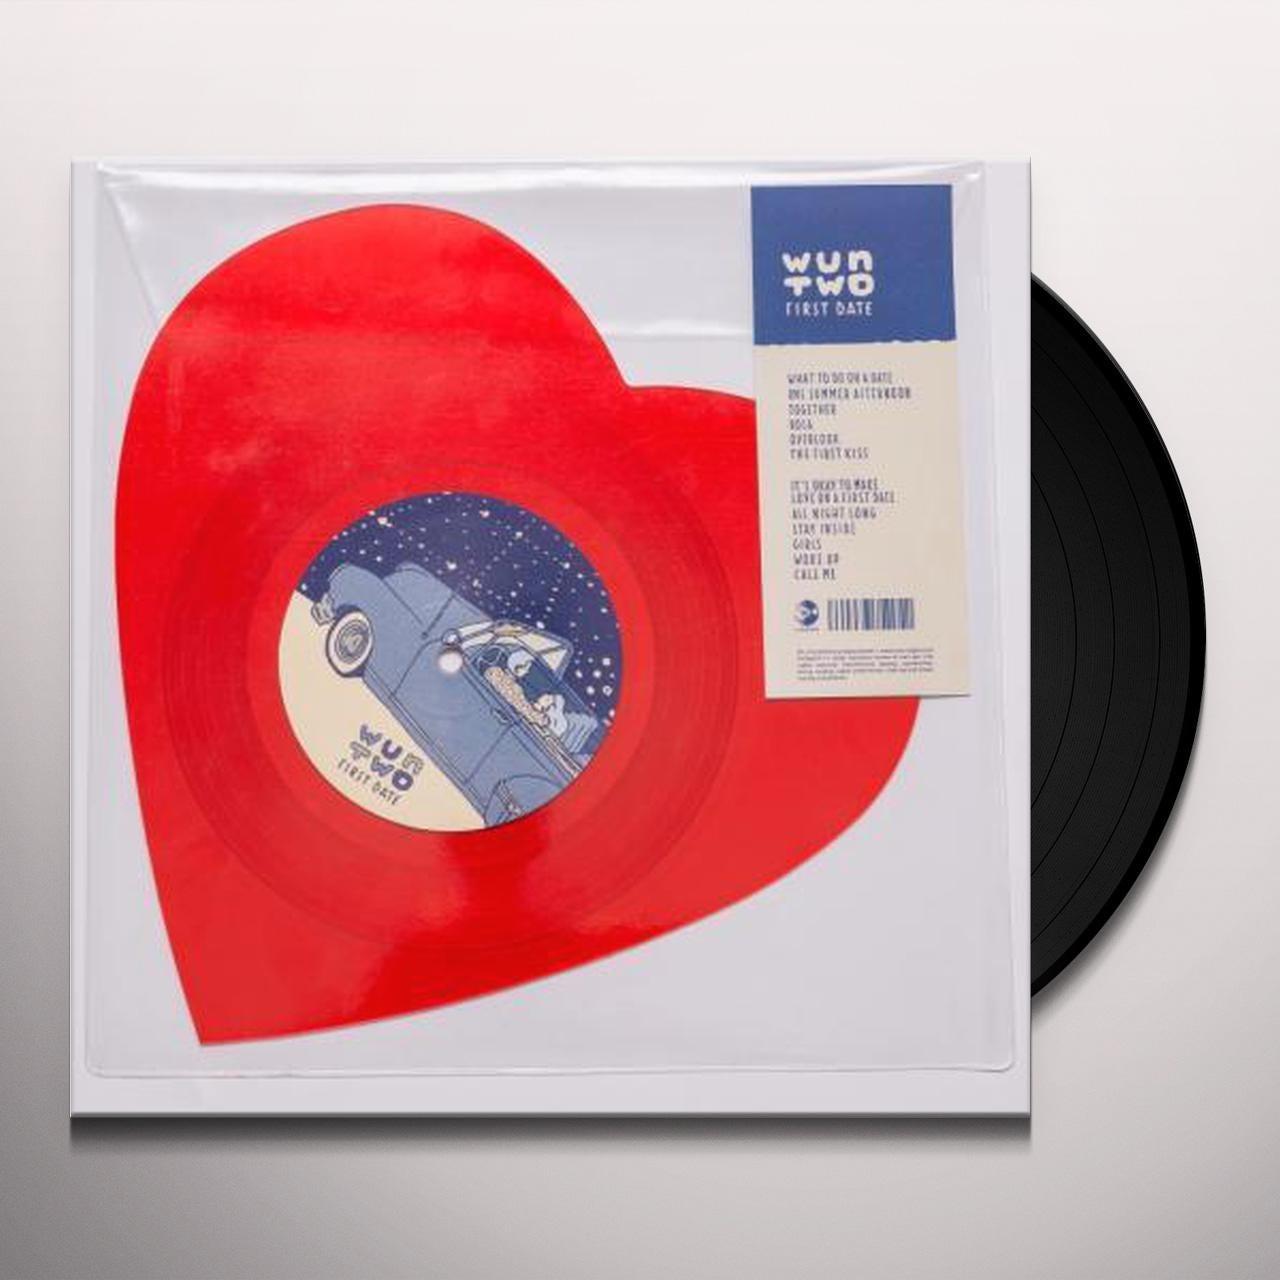 Dating vinyl records